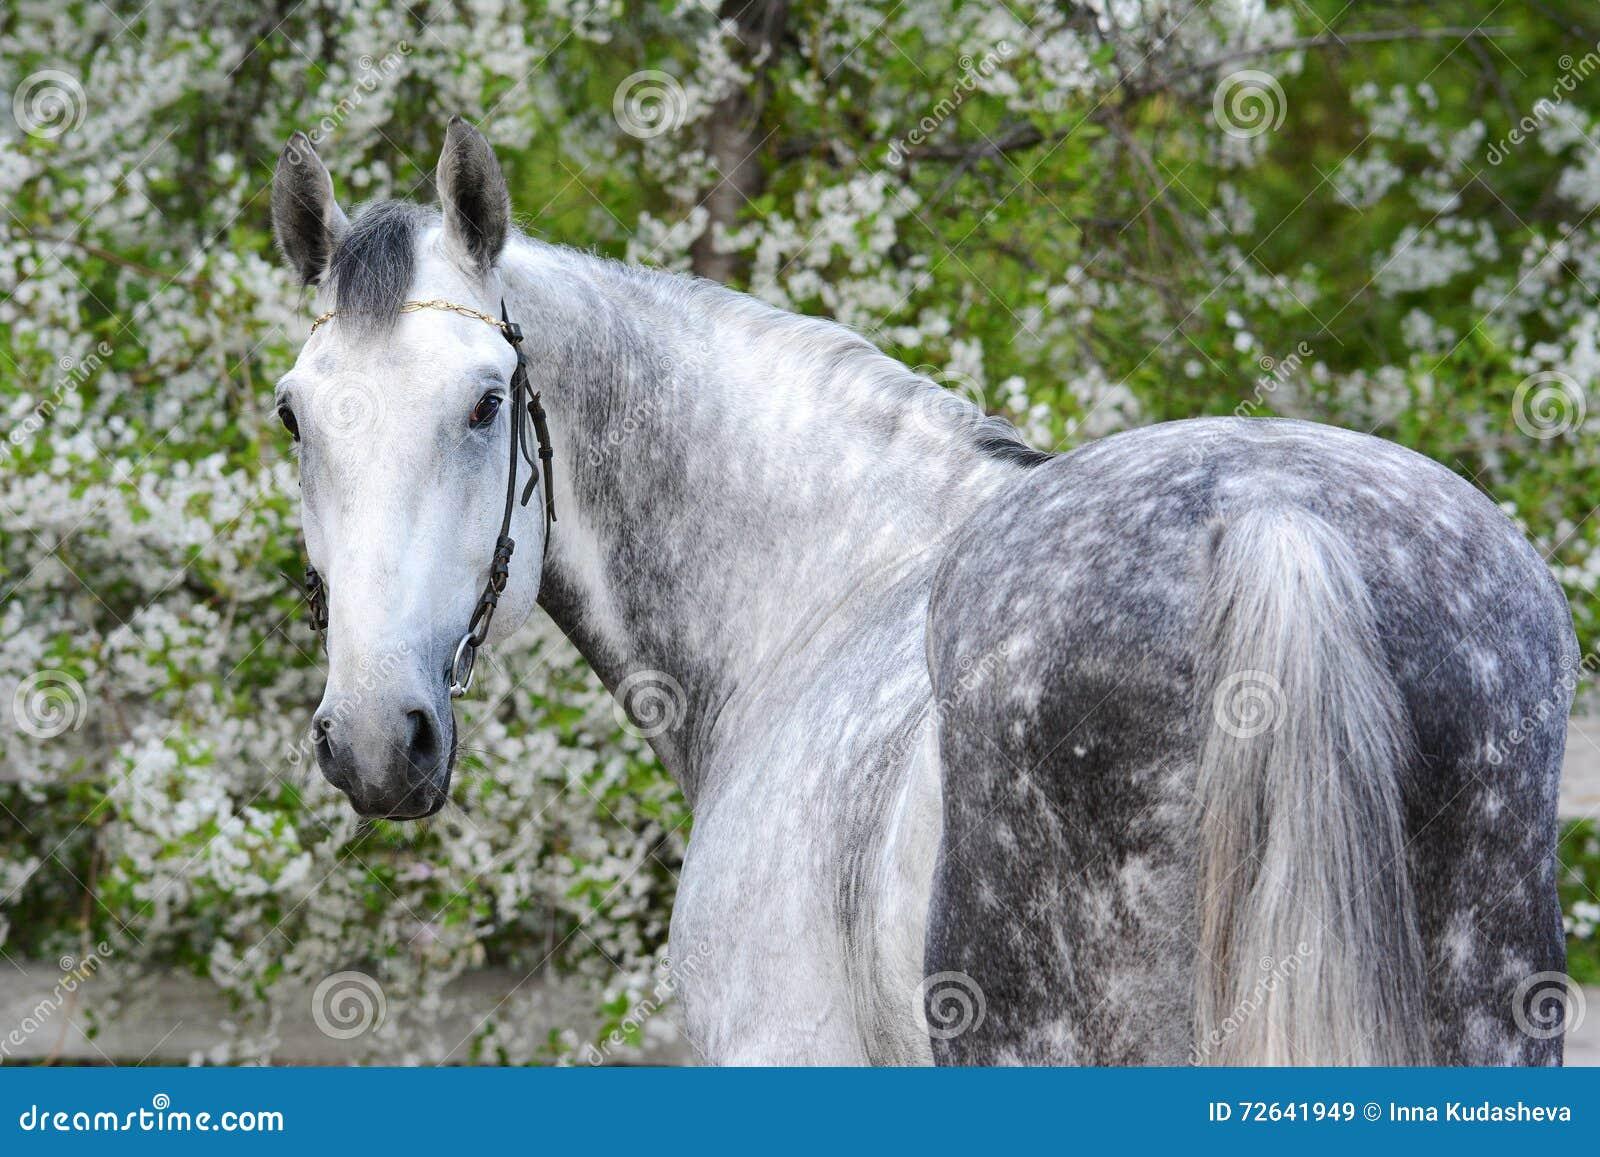 Portrait of a gray orlov trotter breed stallion